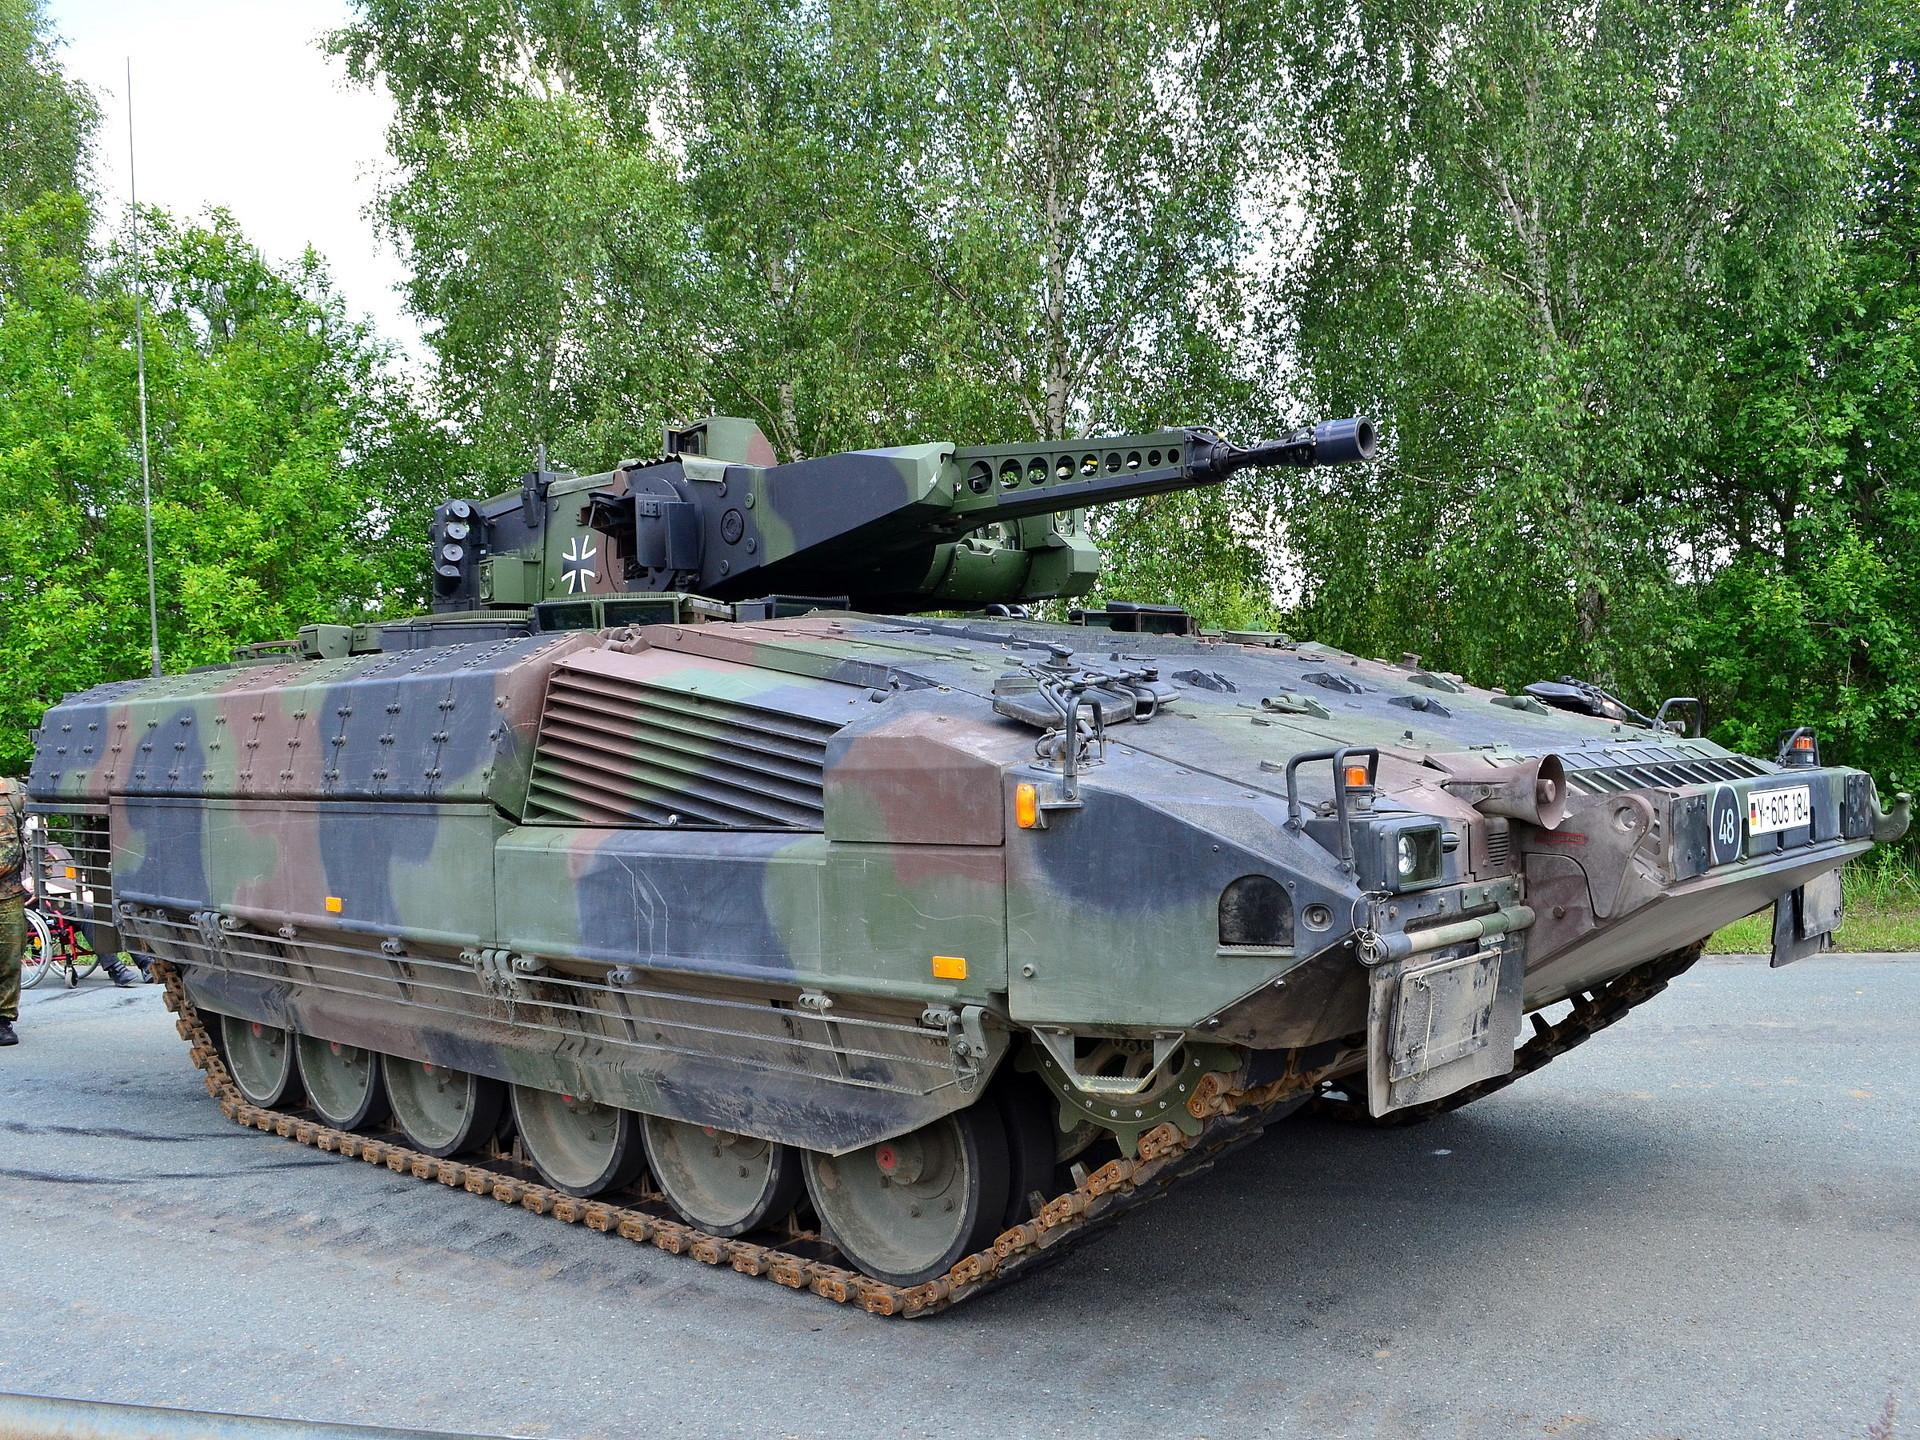 Njemački Schützenpanzer Puma tvrtke Krauss-Maffei Wegmann